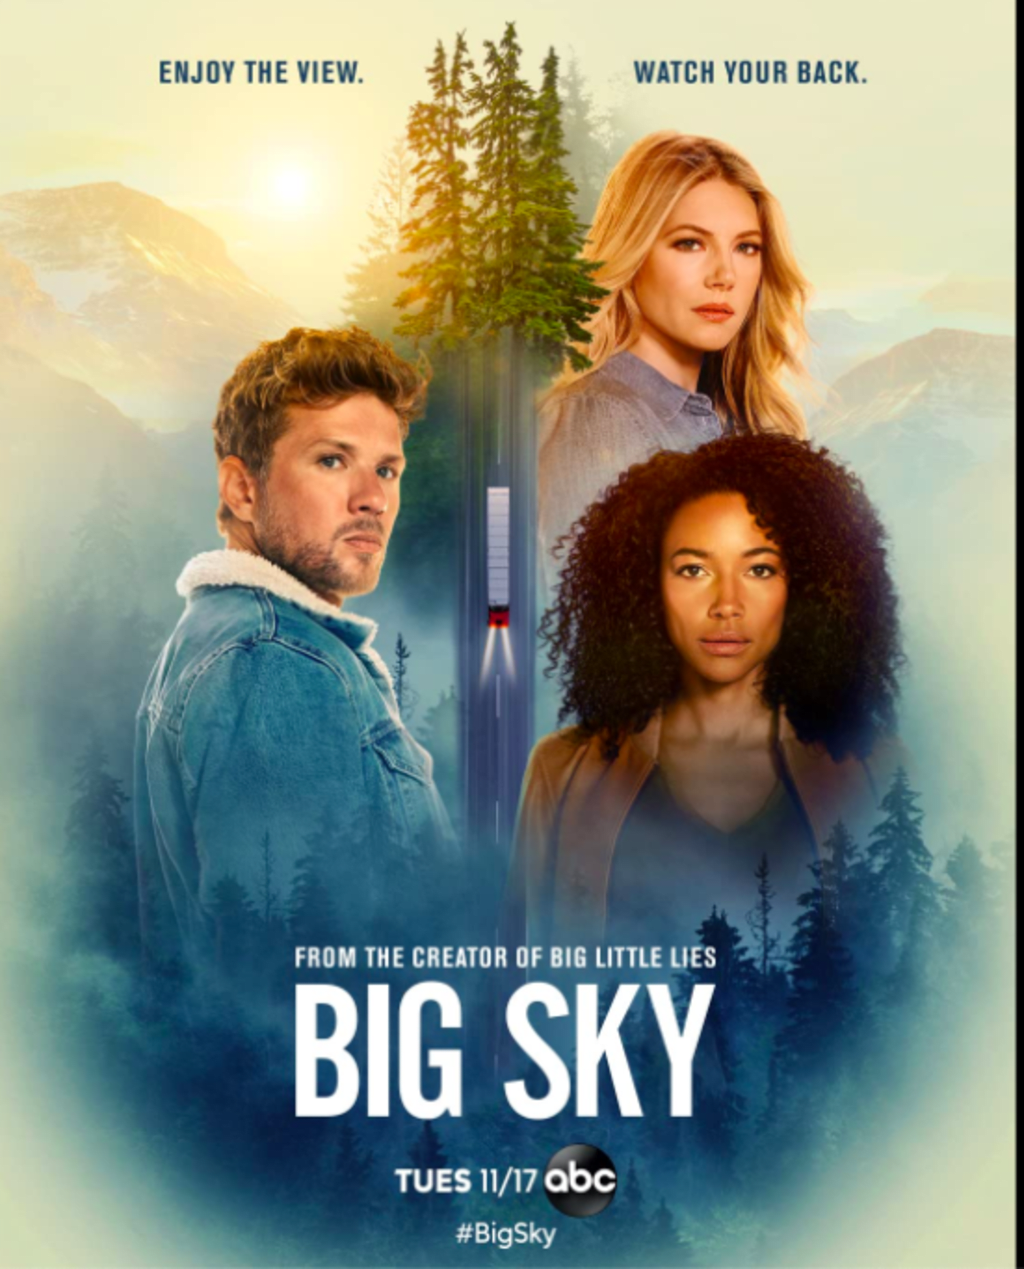 Review of 'Big Sky' 1.1